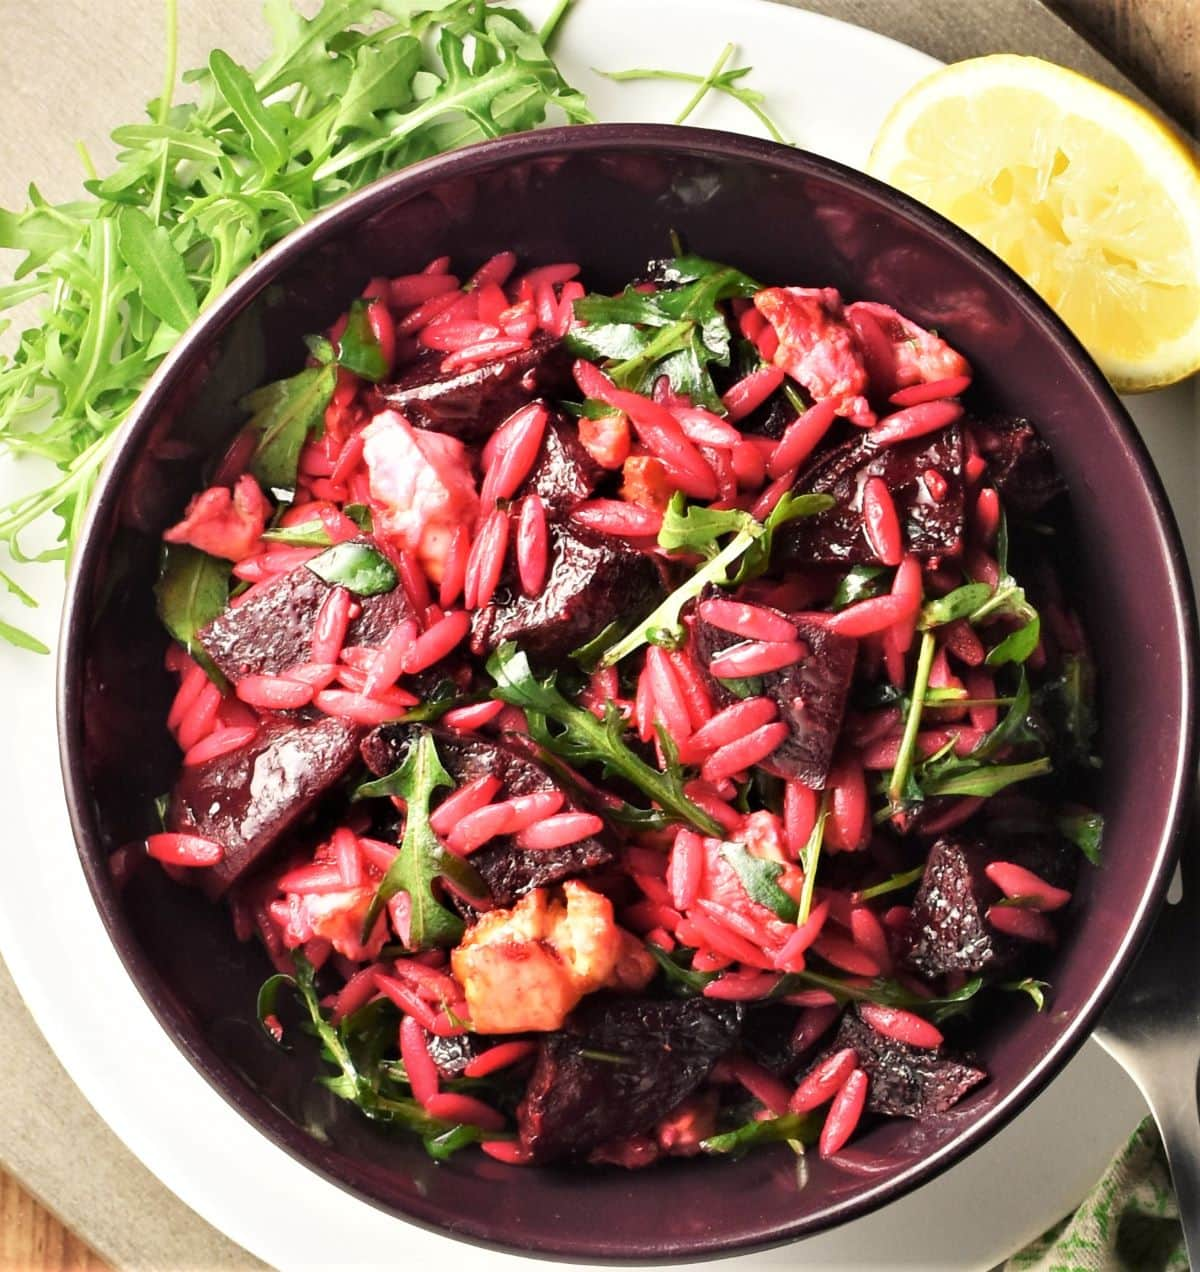 Beet feta salad with pasta in purple bowl.